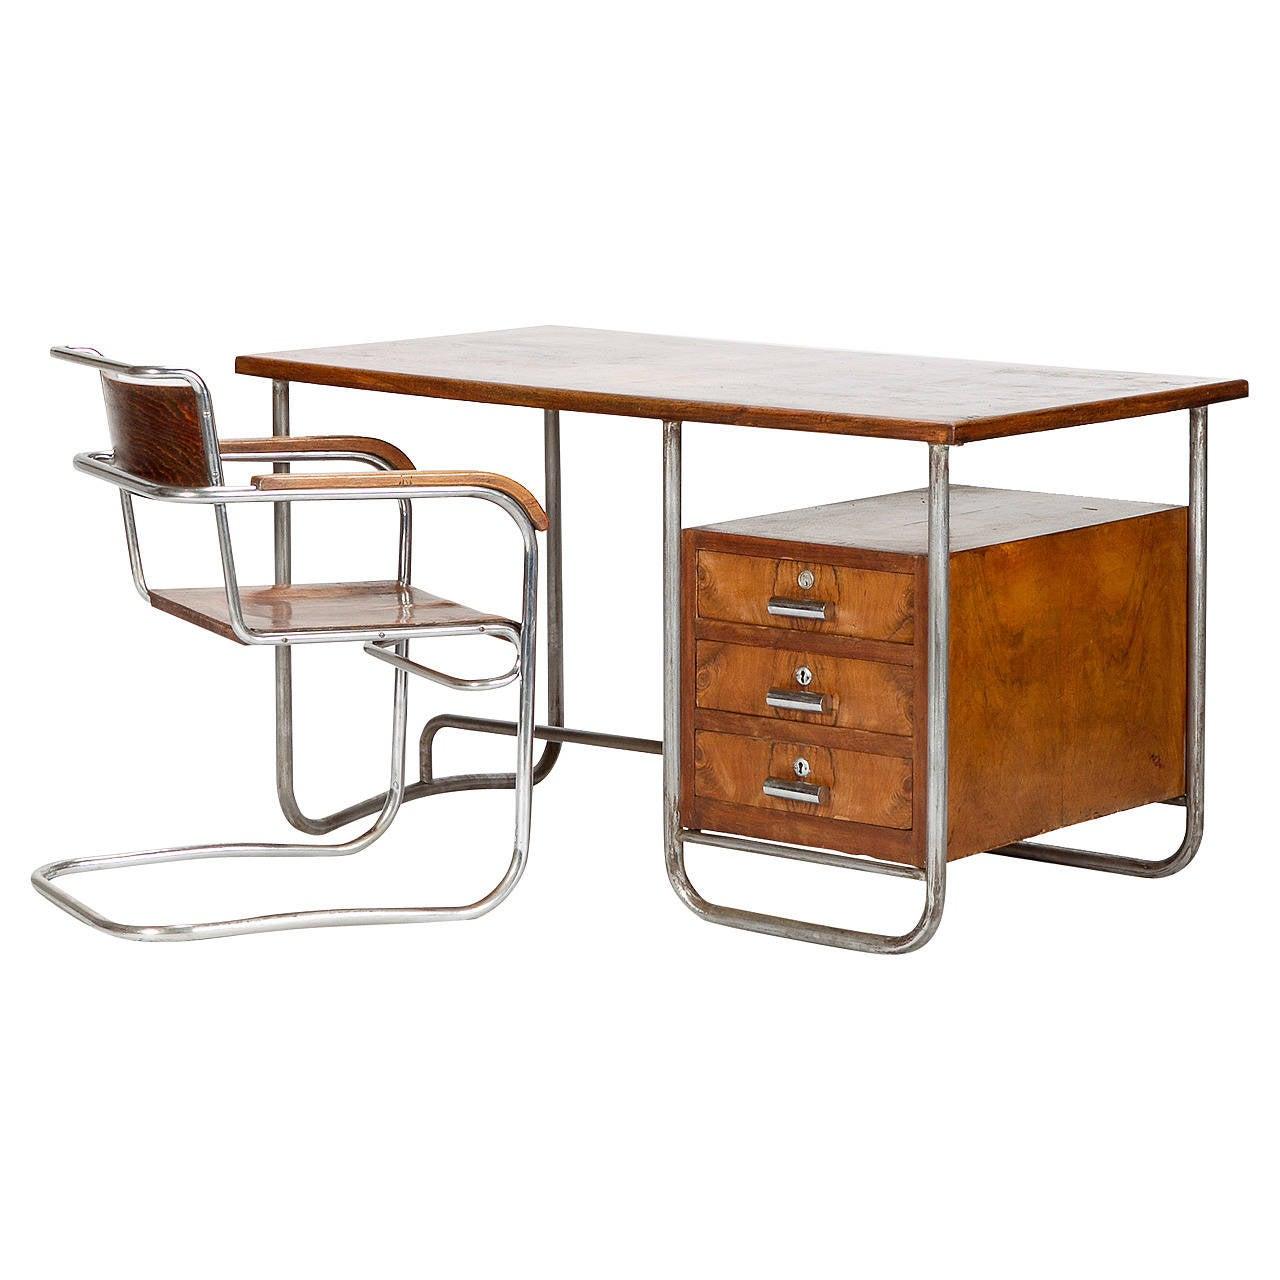 Italian bauhaus desk and chair by marcel breuer 1930s at for Bauhaus italia